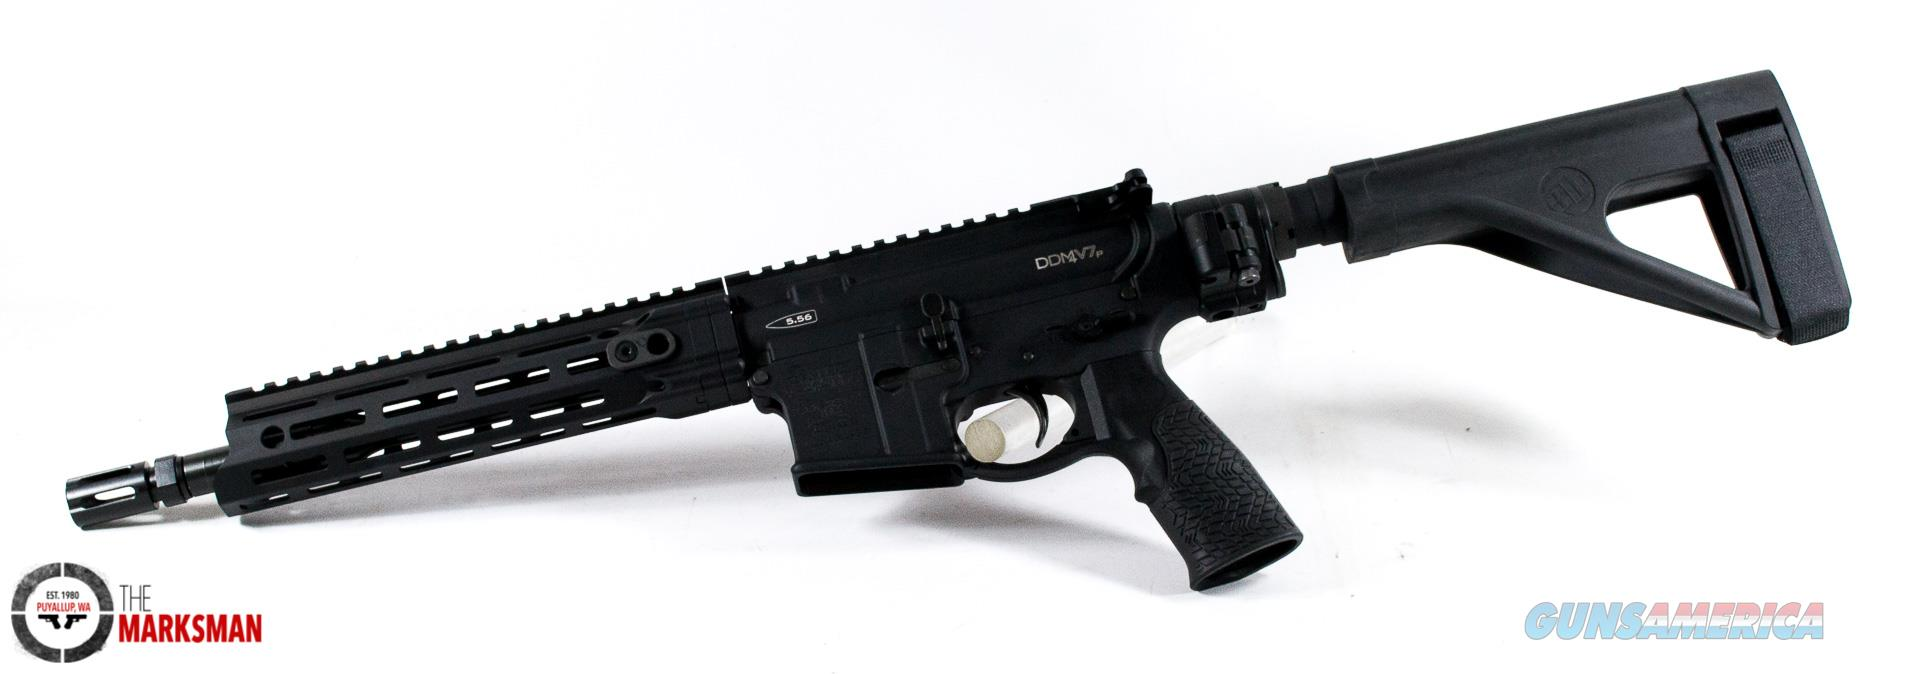 Daniel Defense DDM4 V7 Pistol, 5.56mm NATO NEW Law Tactical Folding Brace, Free Shipping  Guns > Pistols > D Misc Pistols